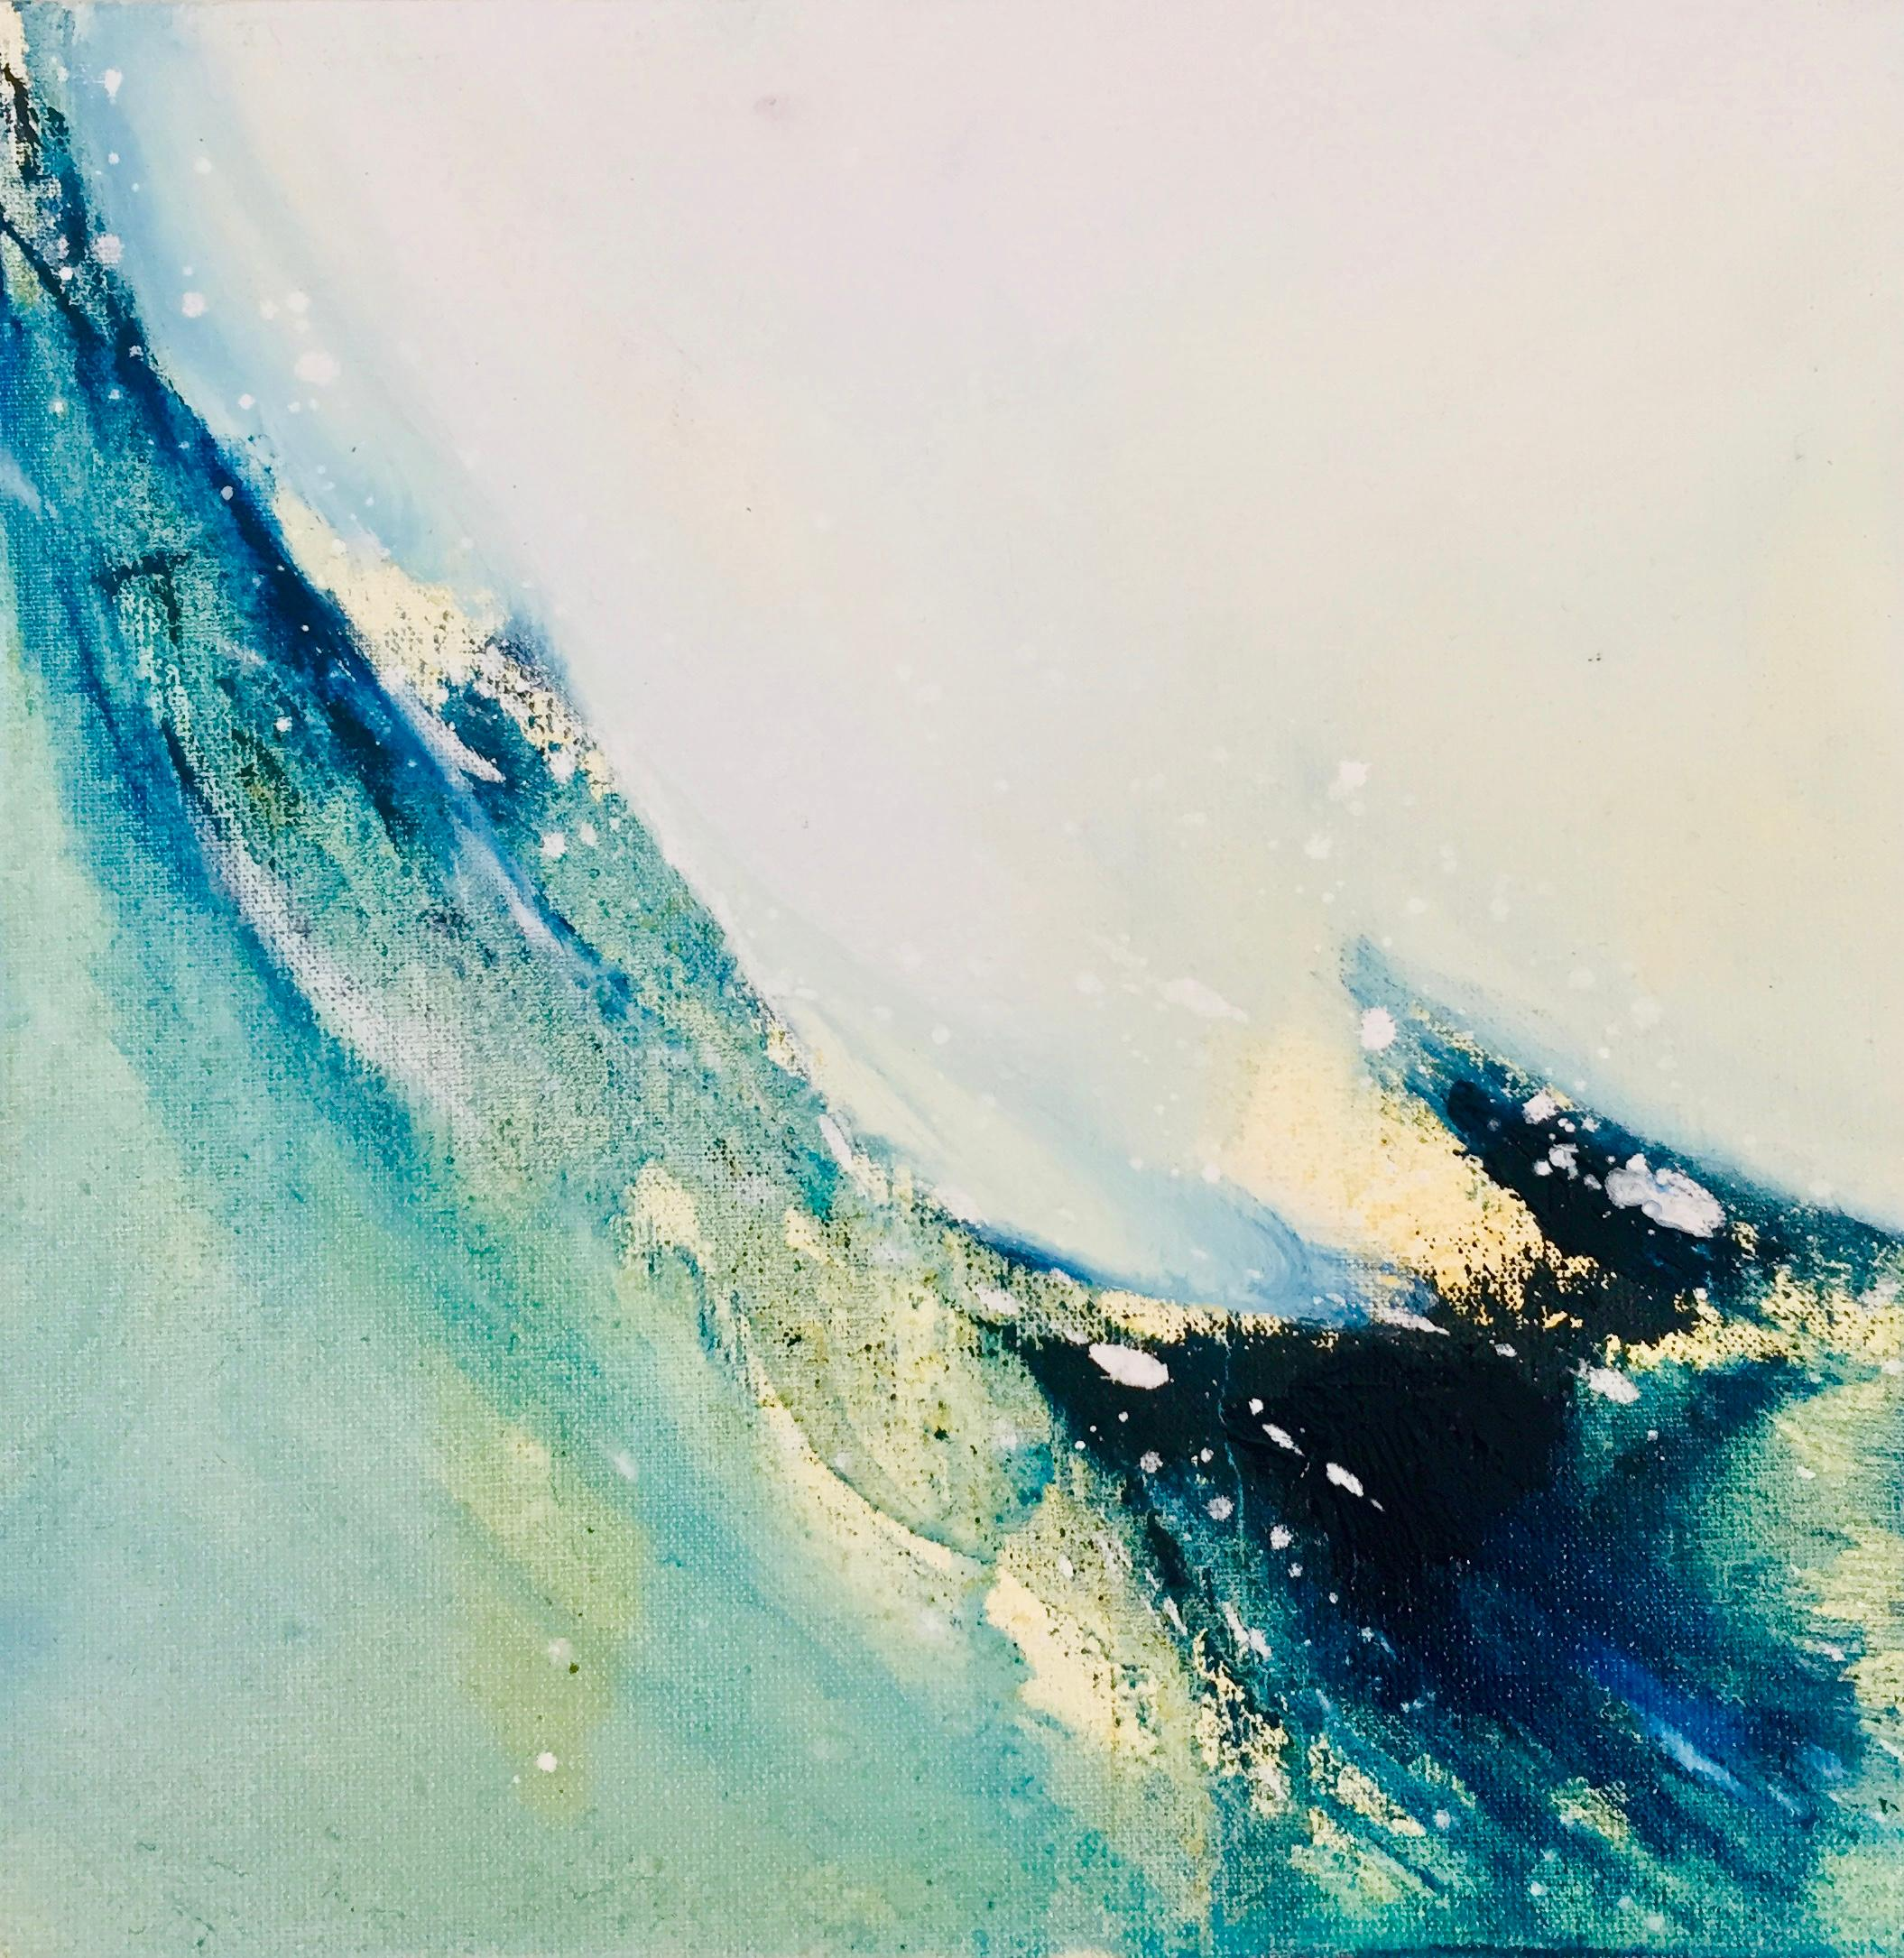 Wave Original Oil paint on canvas board Seascape blue vibrant signed